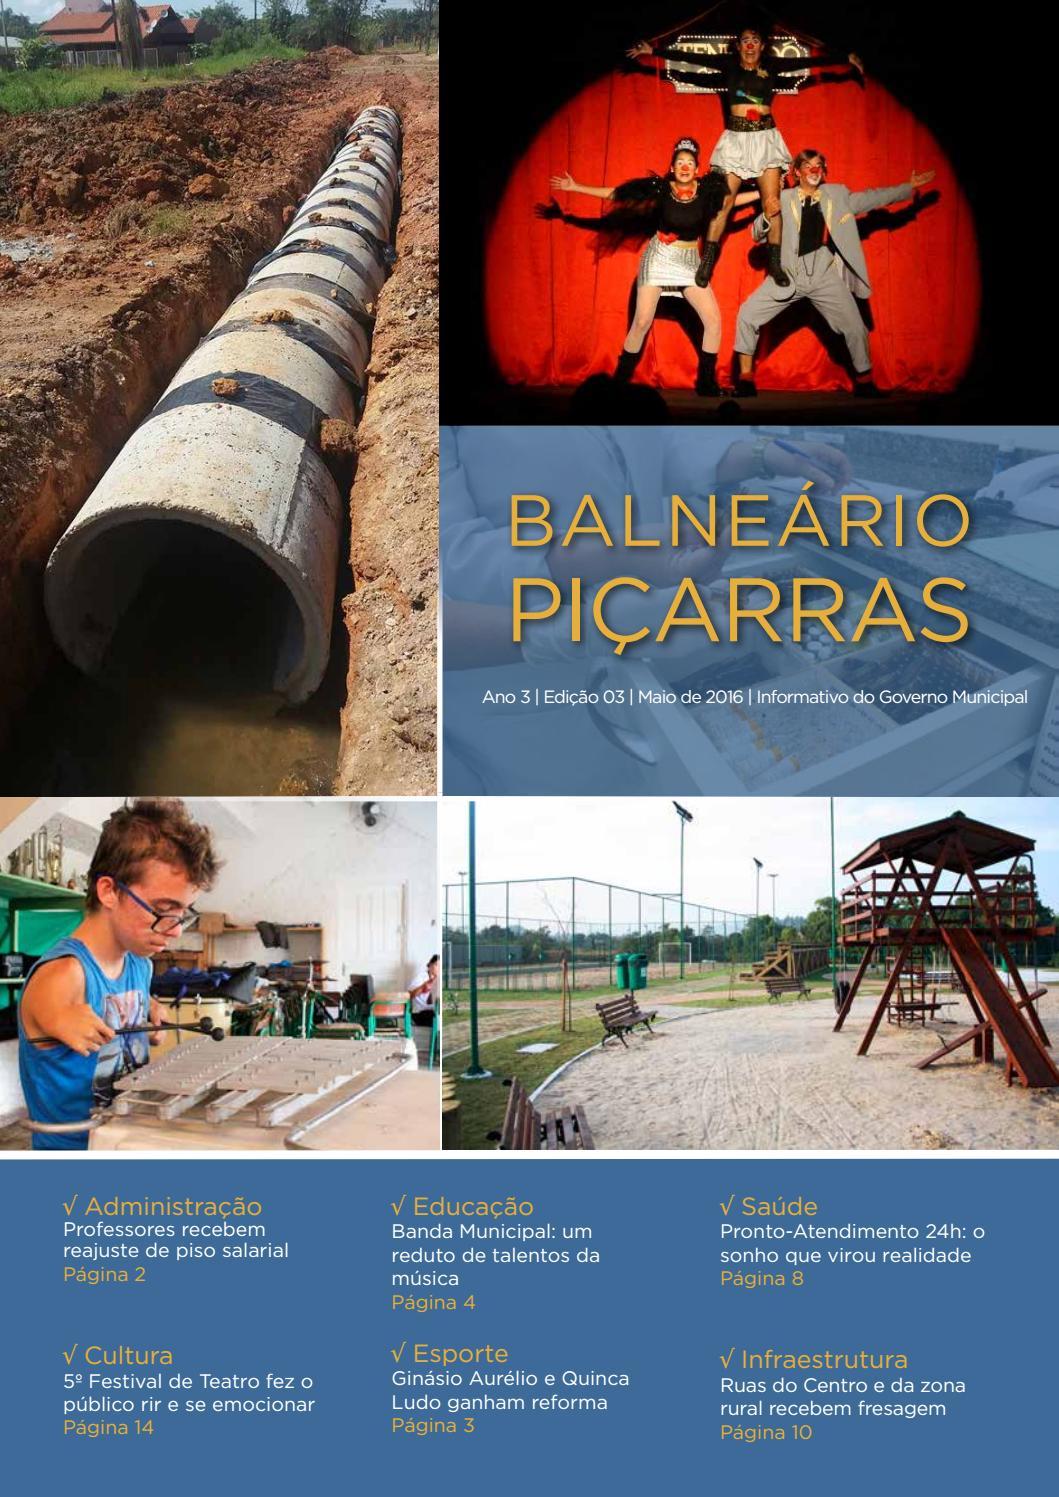 f8ad5a8cfc Informativo 03 by Joao Pedro Machado Pereira - issuu